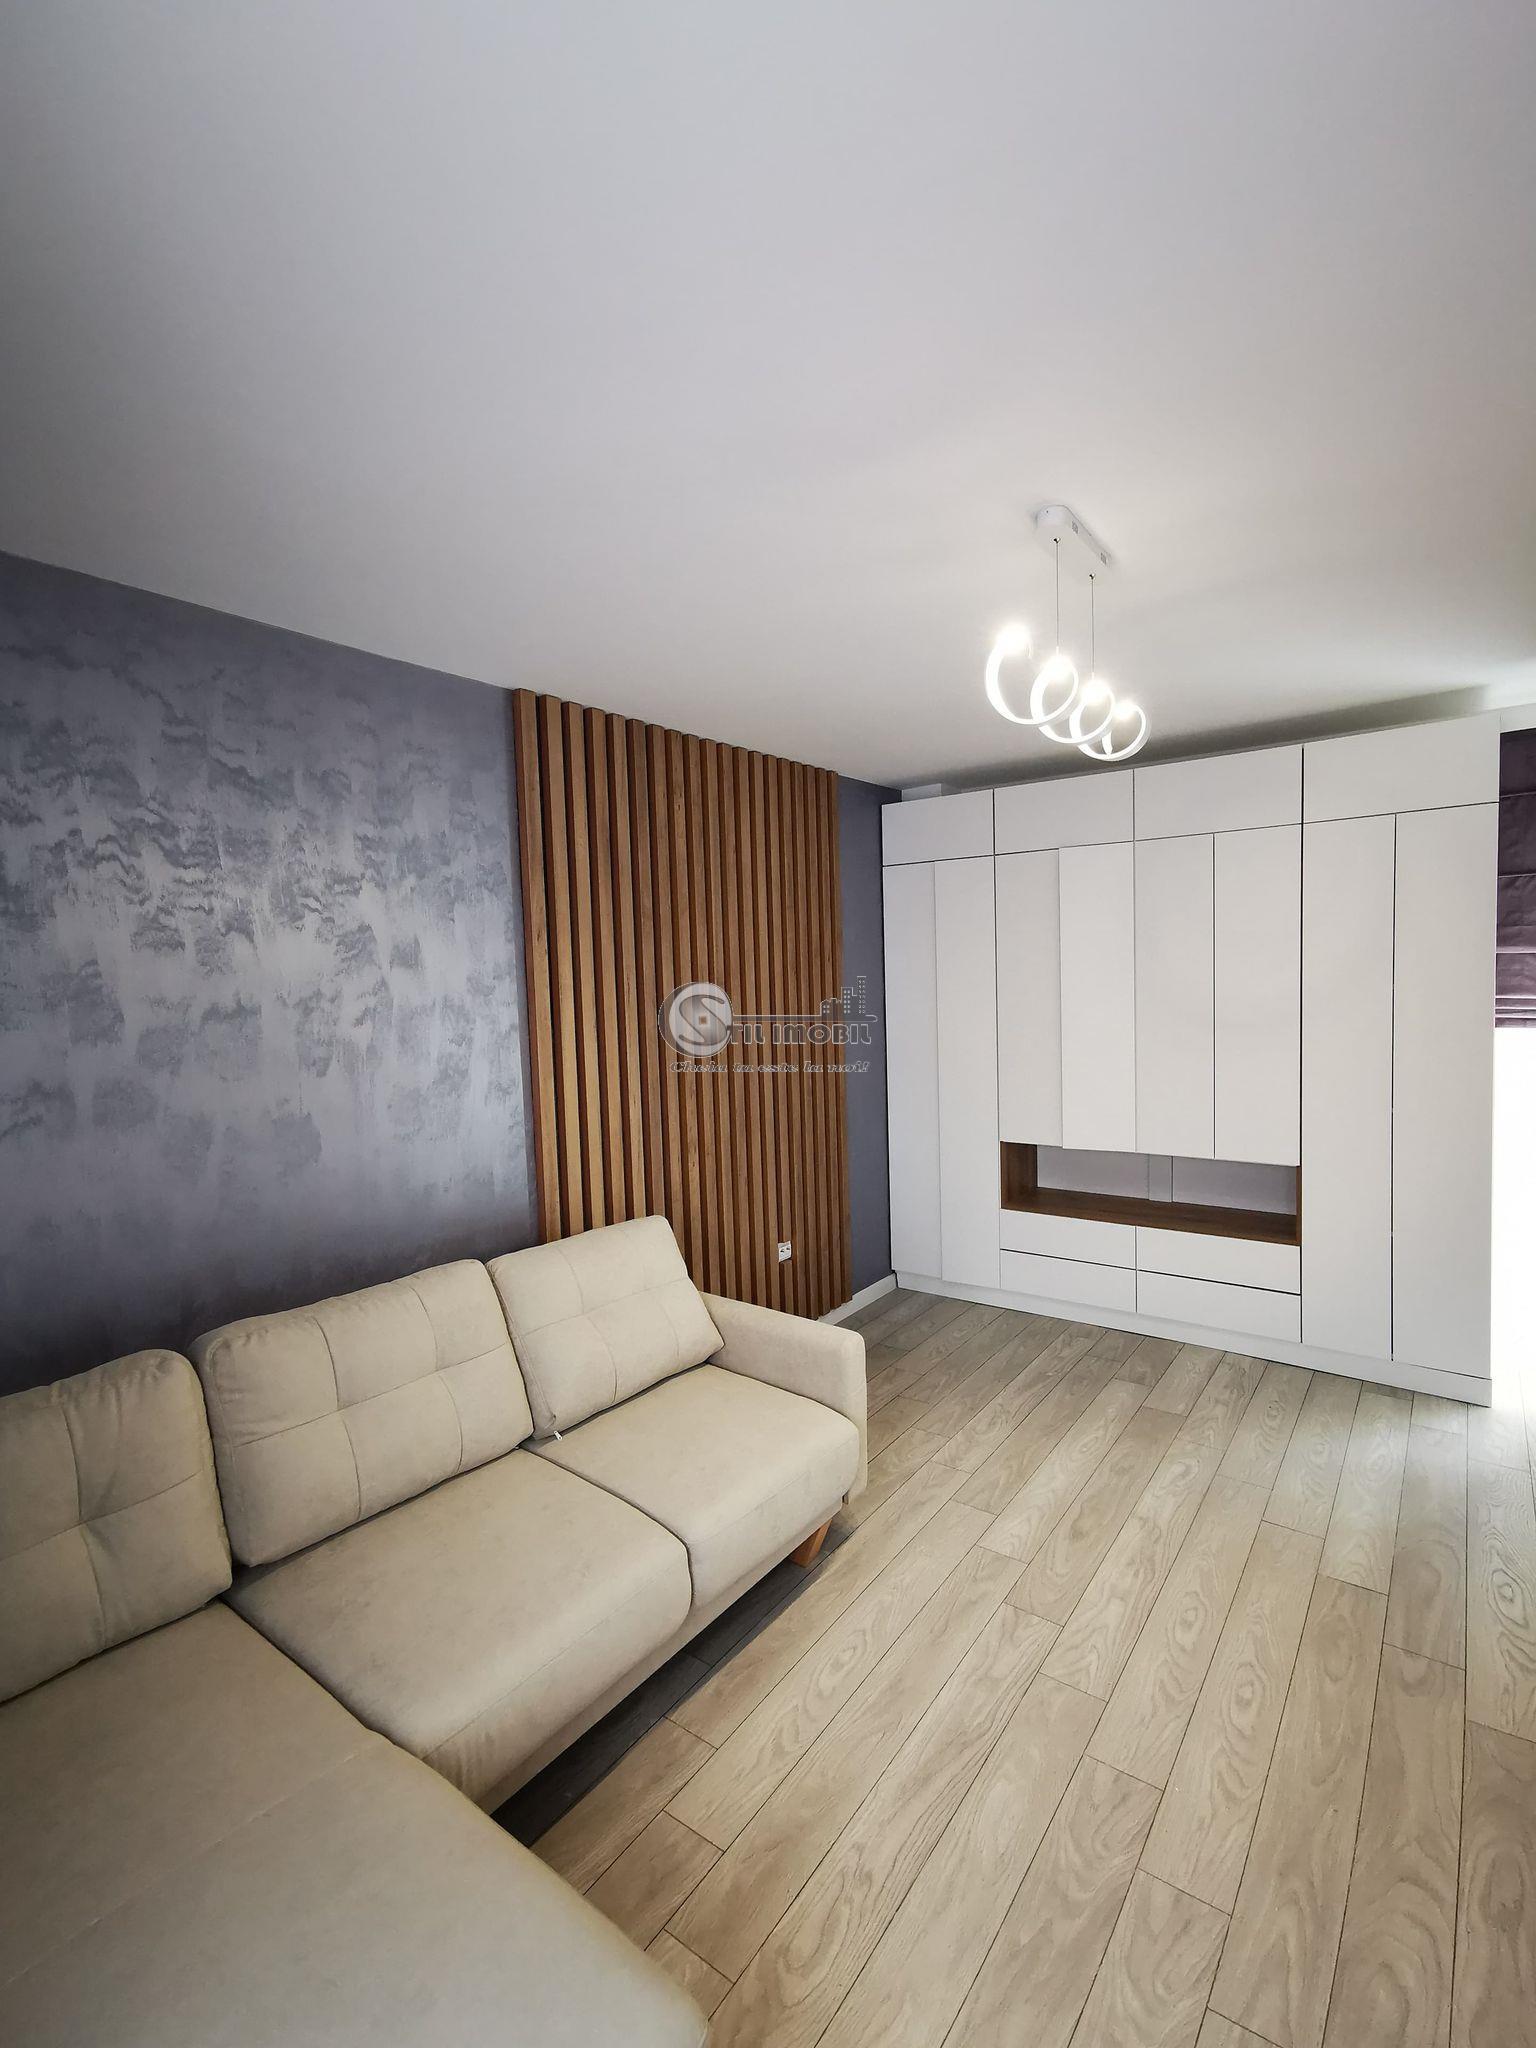 Apartament cu 2 camere decomandat, 62mp, Pacurari OMV